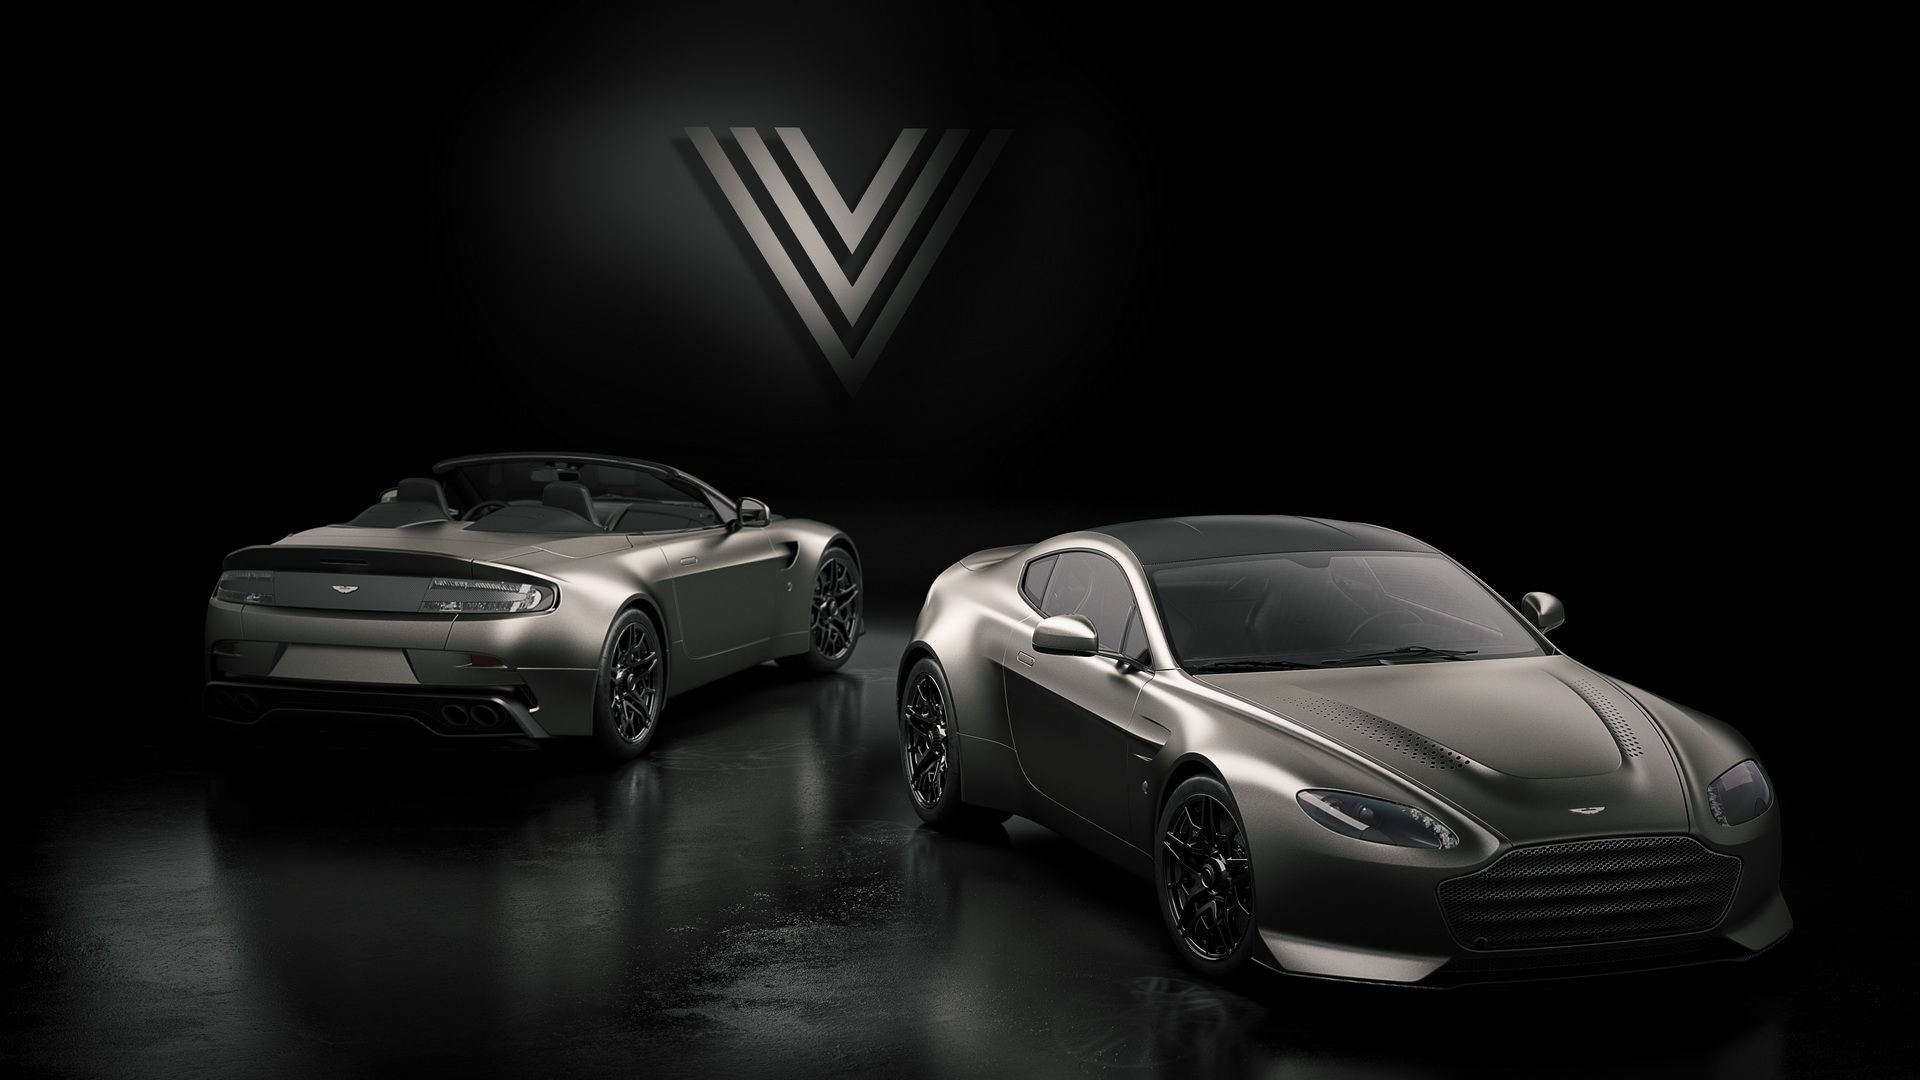 AstonMartin-V12Vantage-V600-02